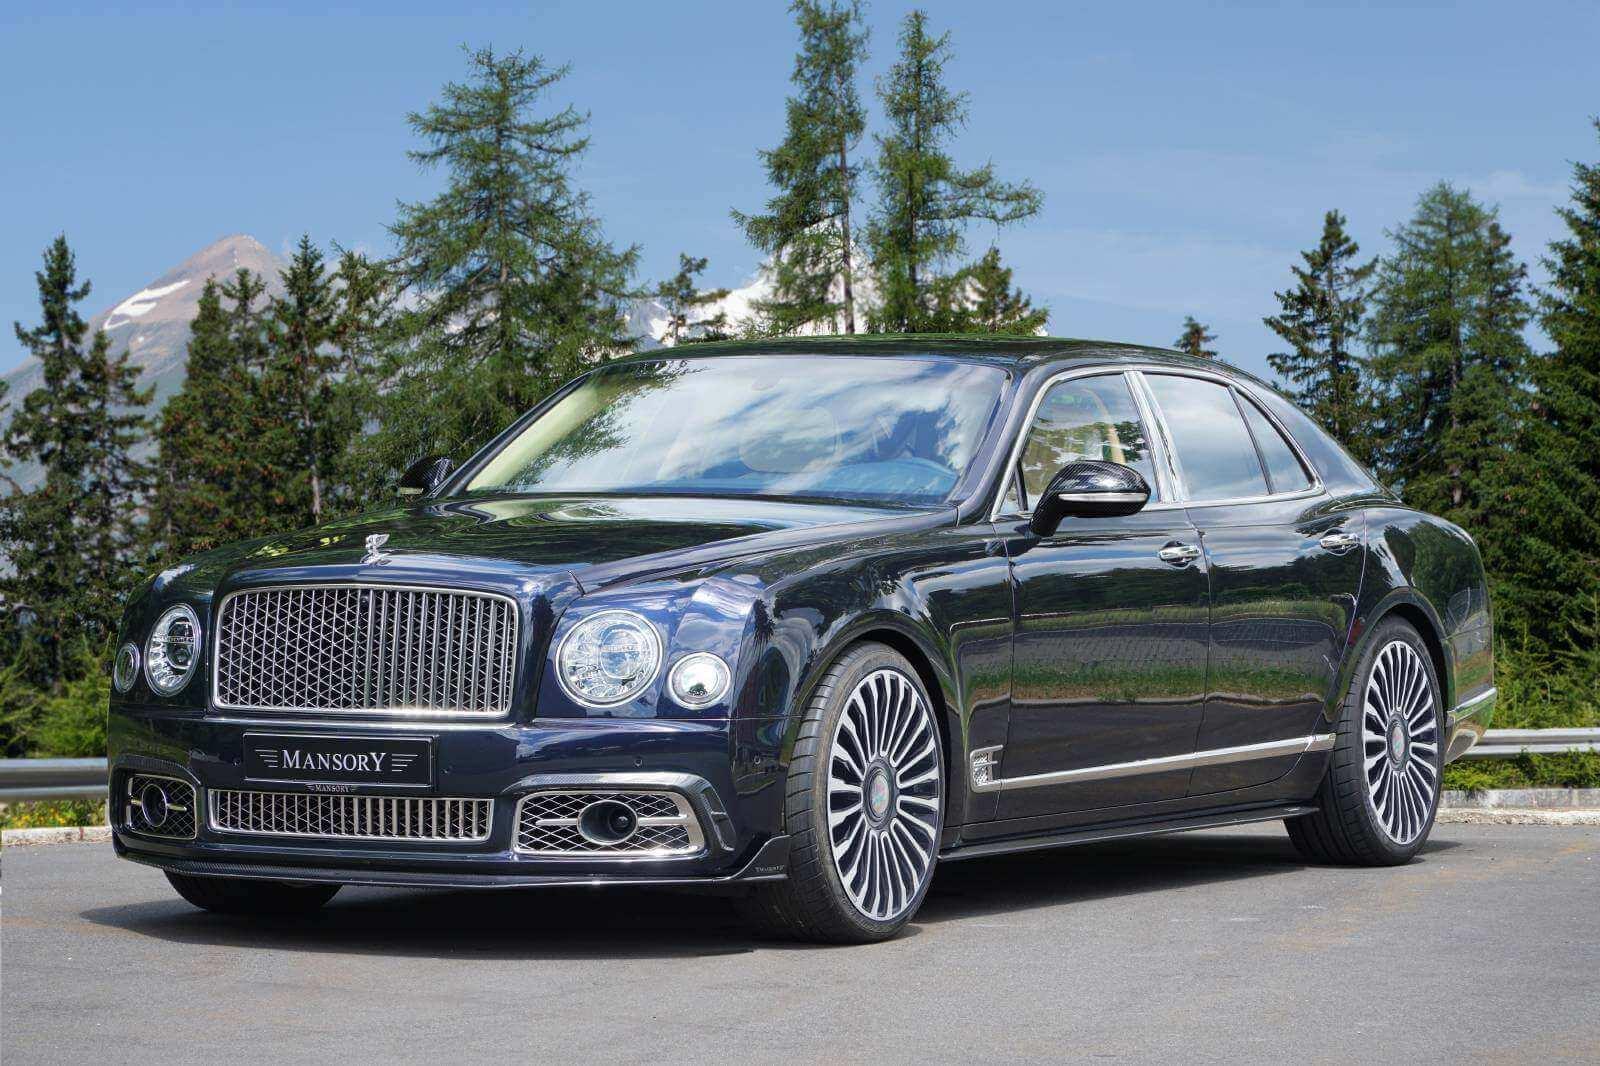 54 Best Review 2020 Bentley Muslane Review by 2020 Bentley Muslane